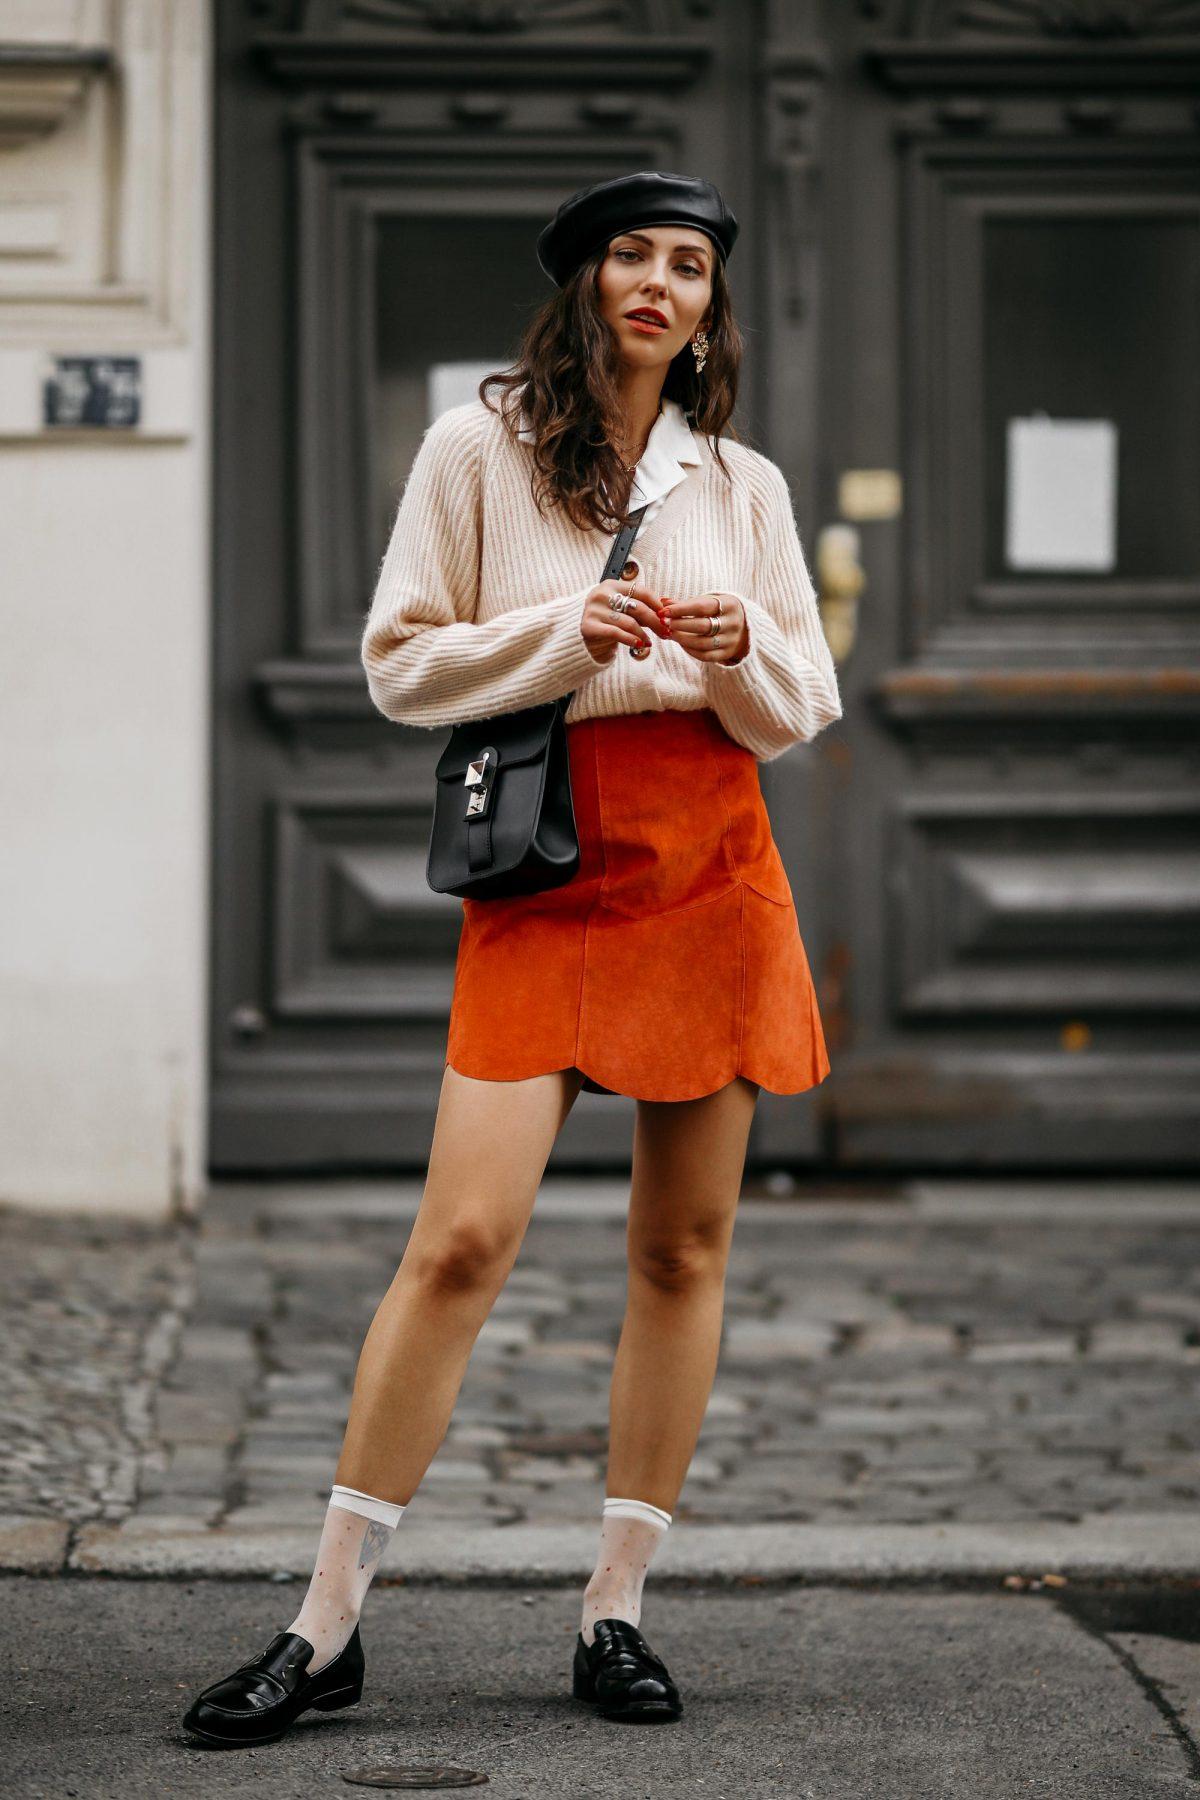 The Parisienne Spring